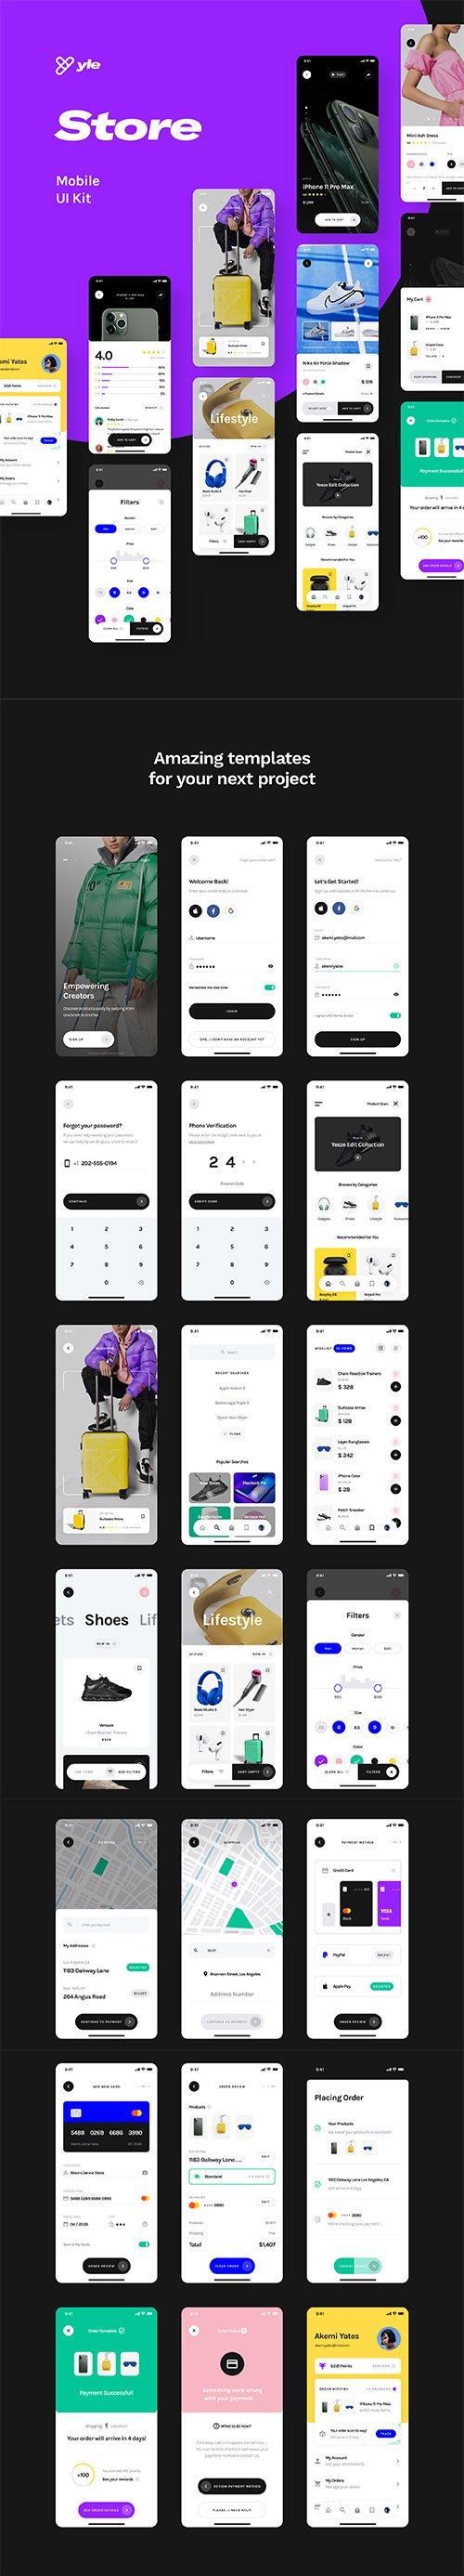 Yle Store UI Kit